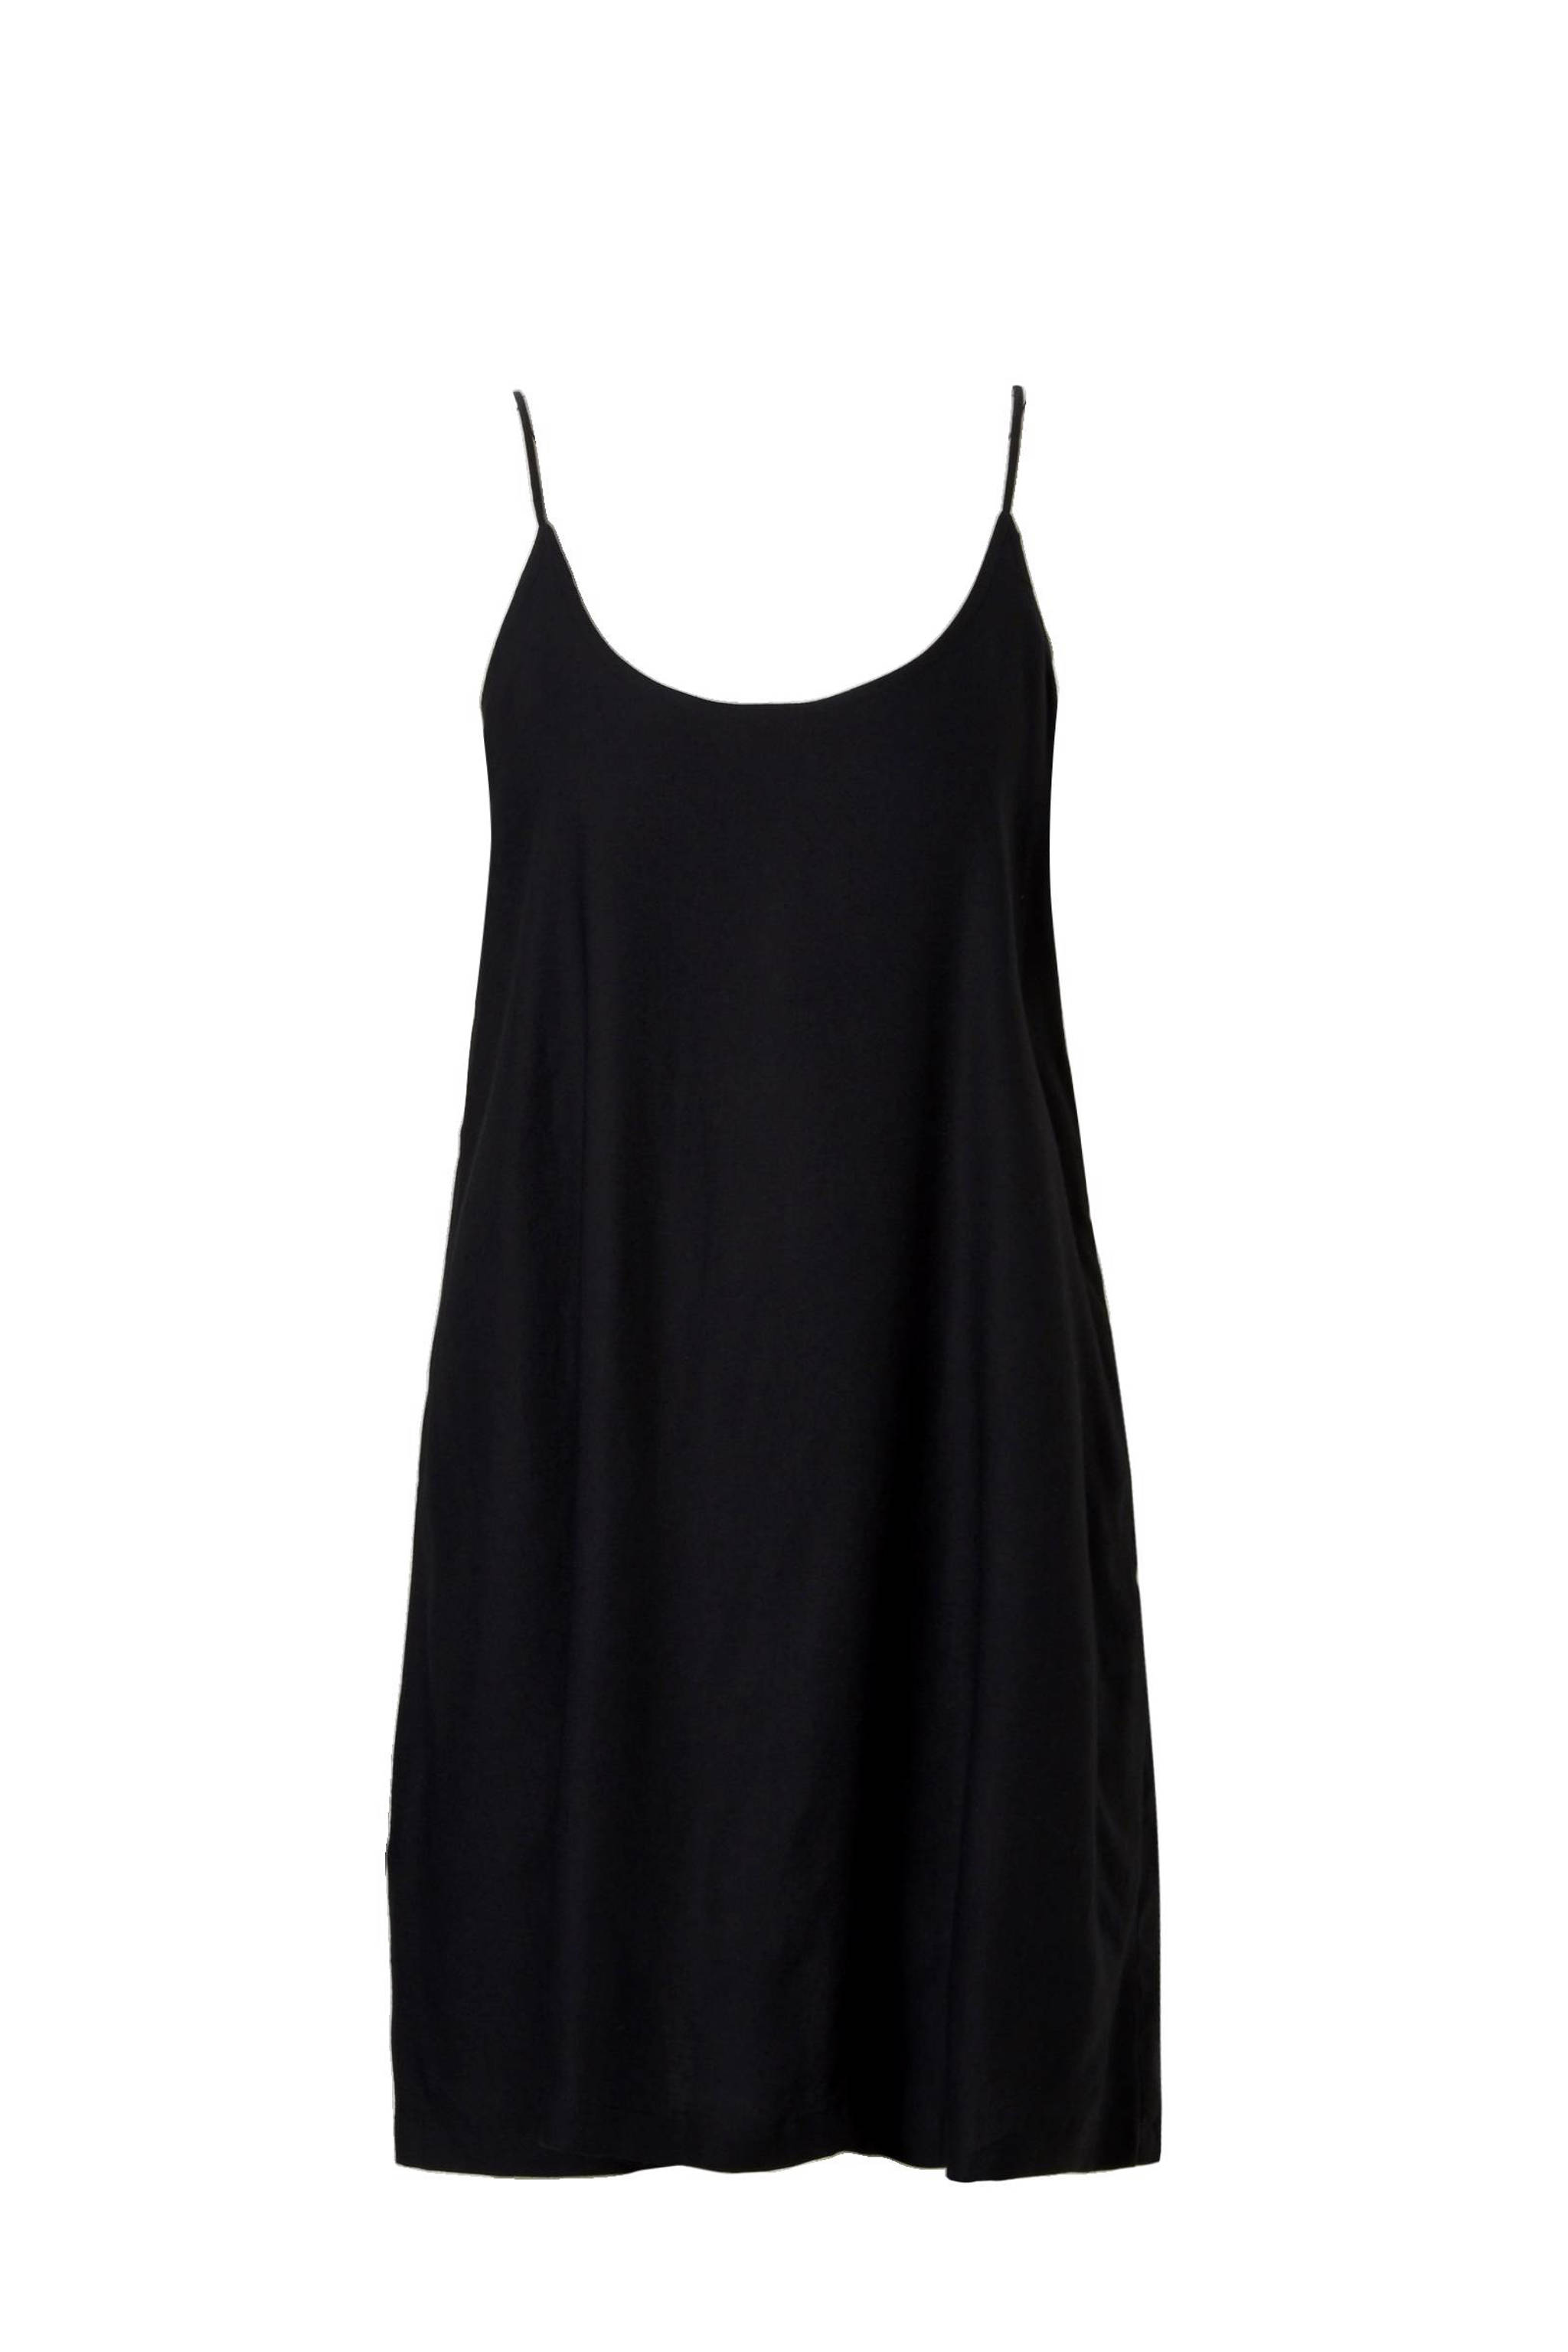 628675e6a38b65 Oscar Jane jurk